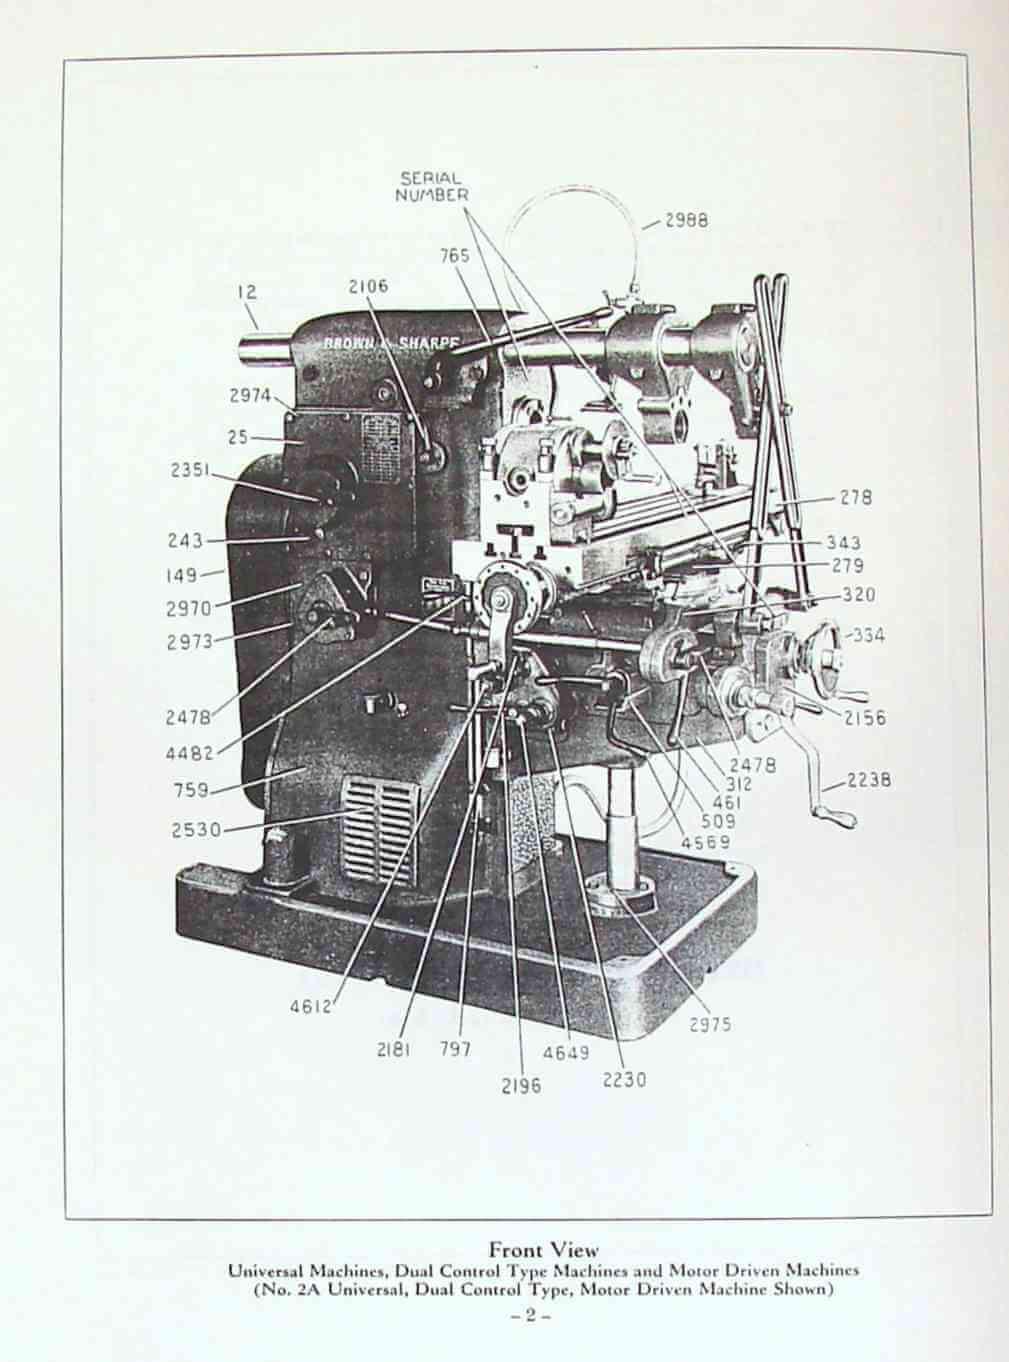 sharp milling machine parts